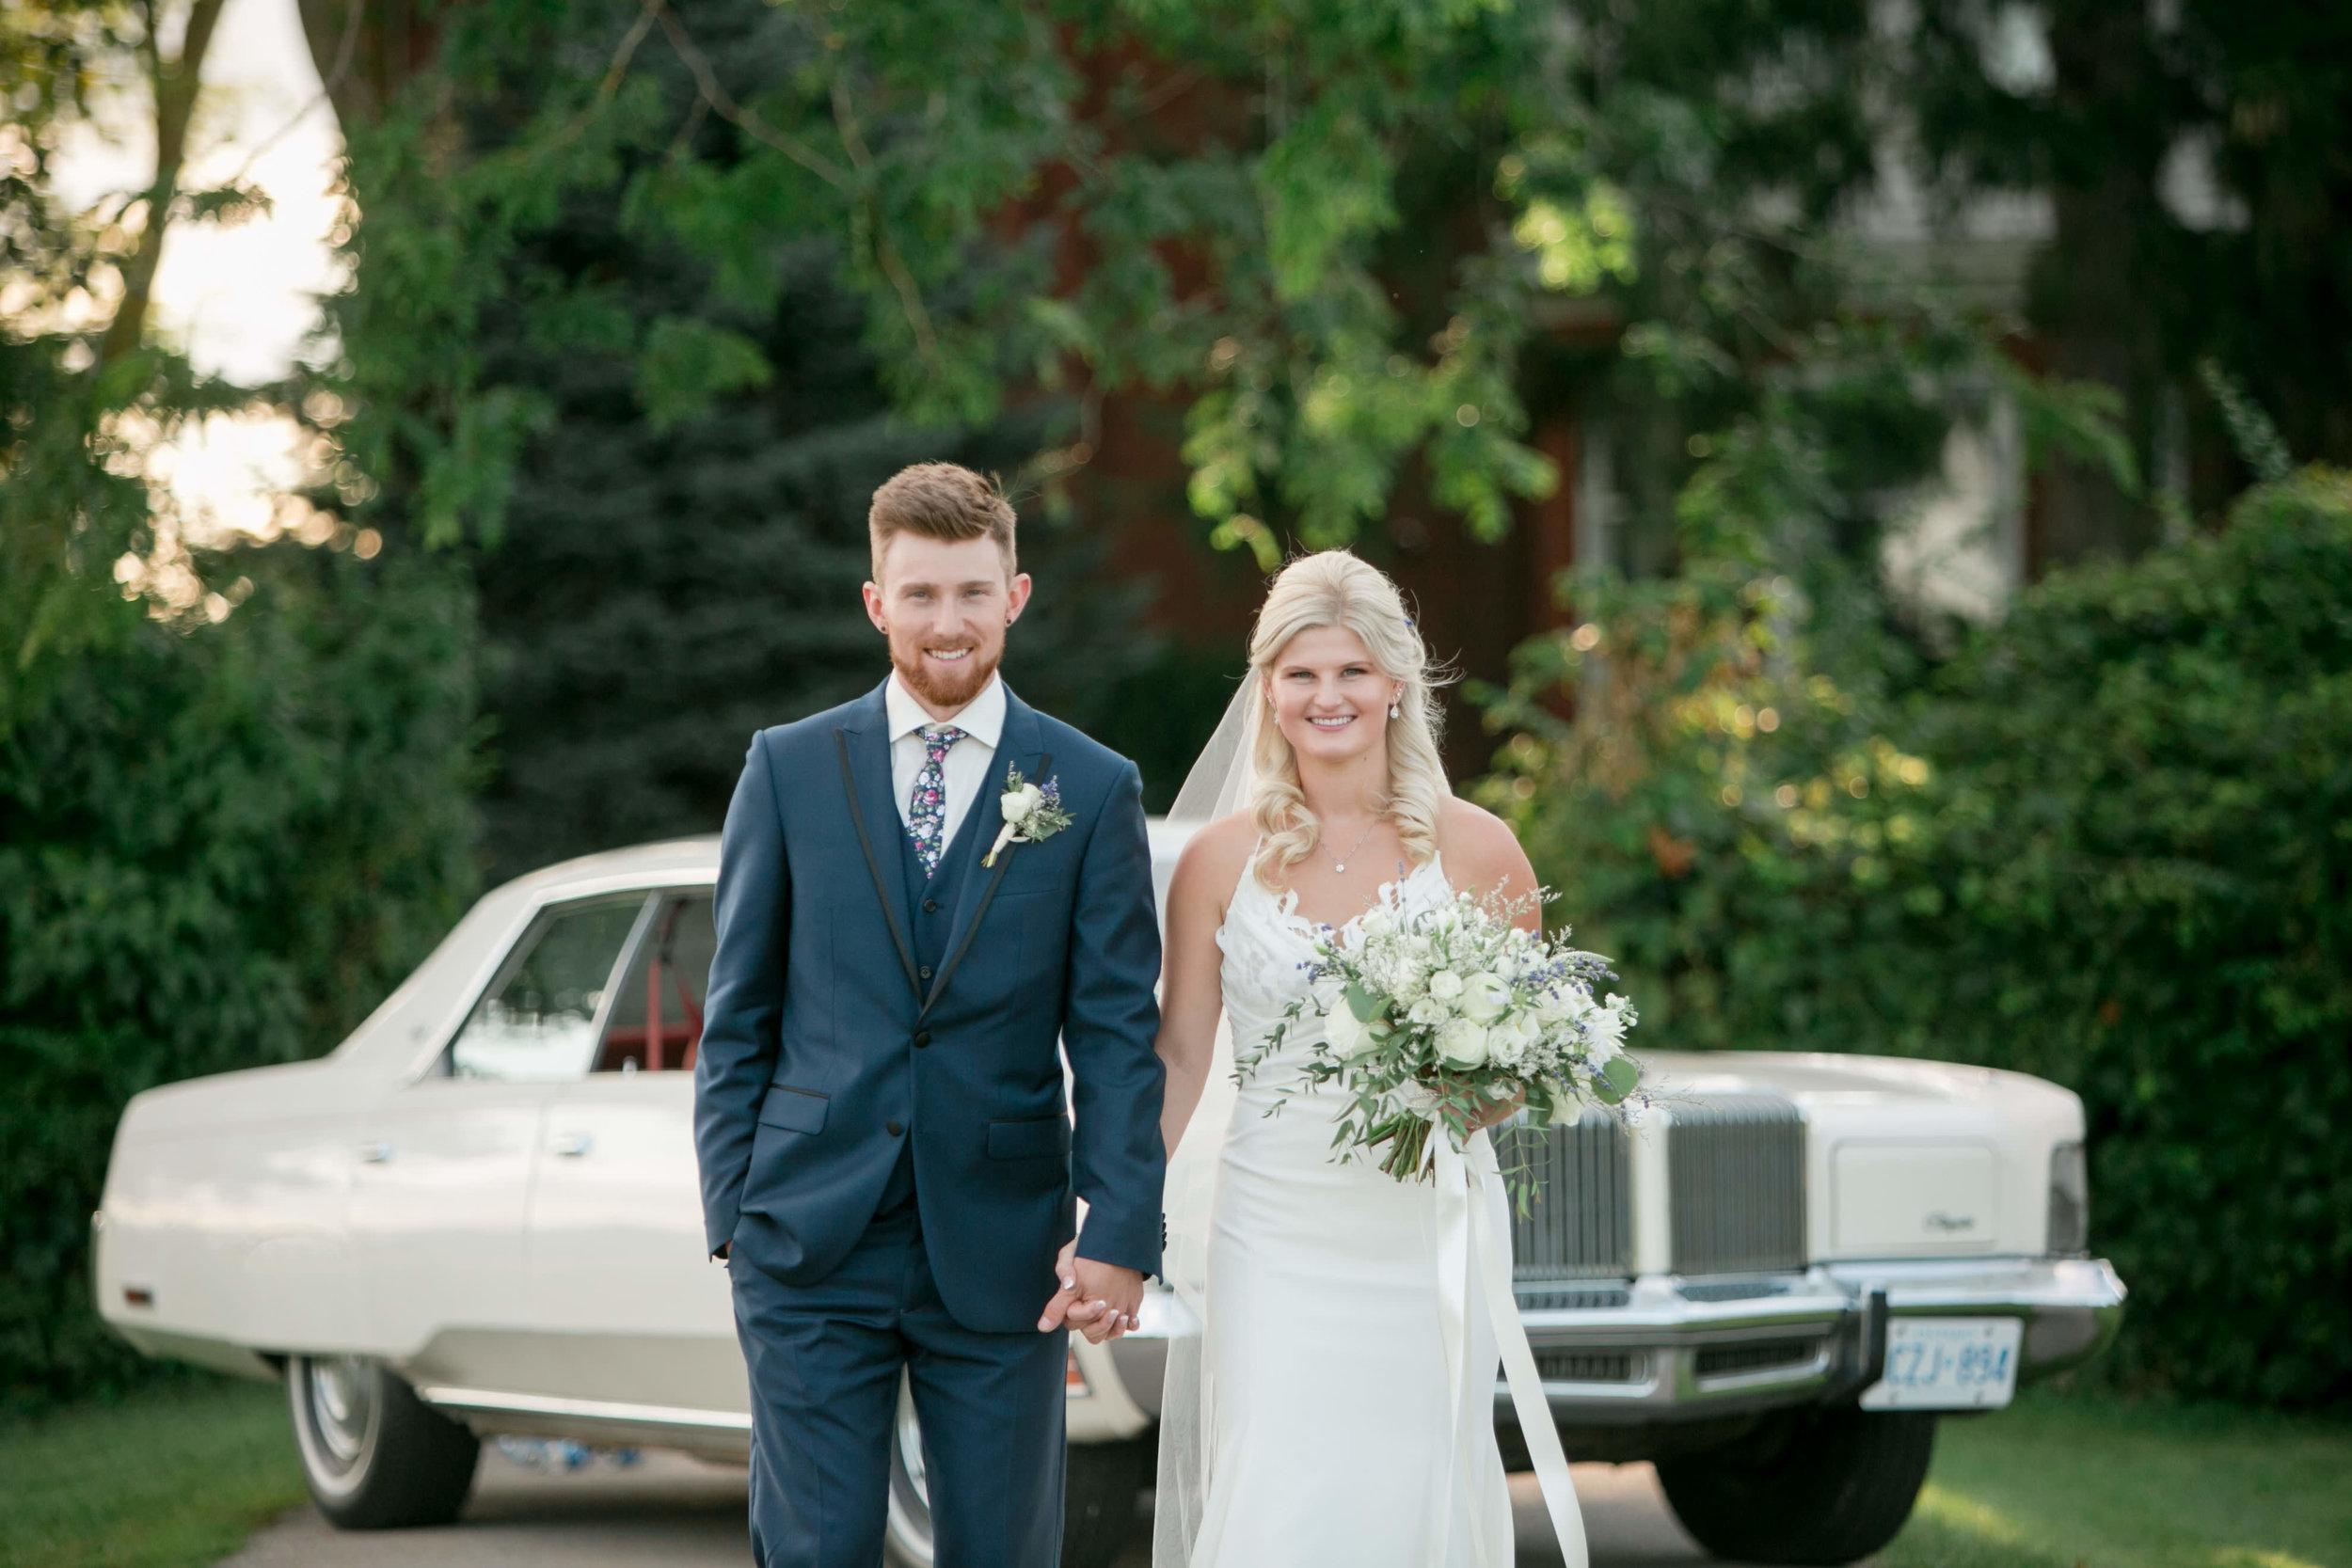 Maddy___Brandon___Daniel_Ricci_Weddings_High_Res._Finals_428.jpg